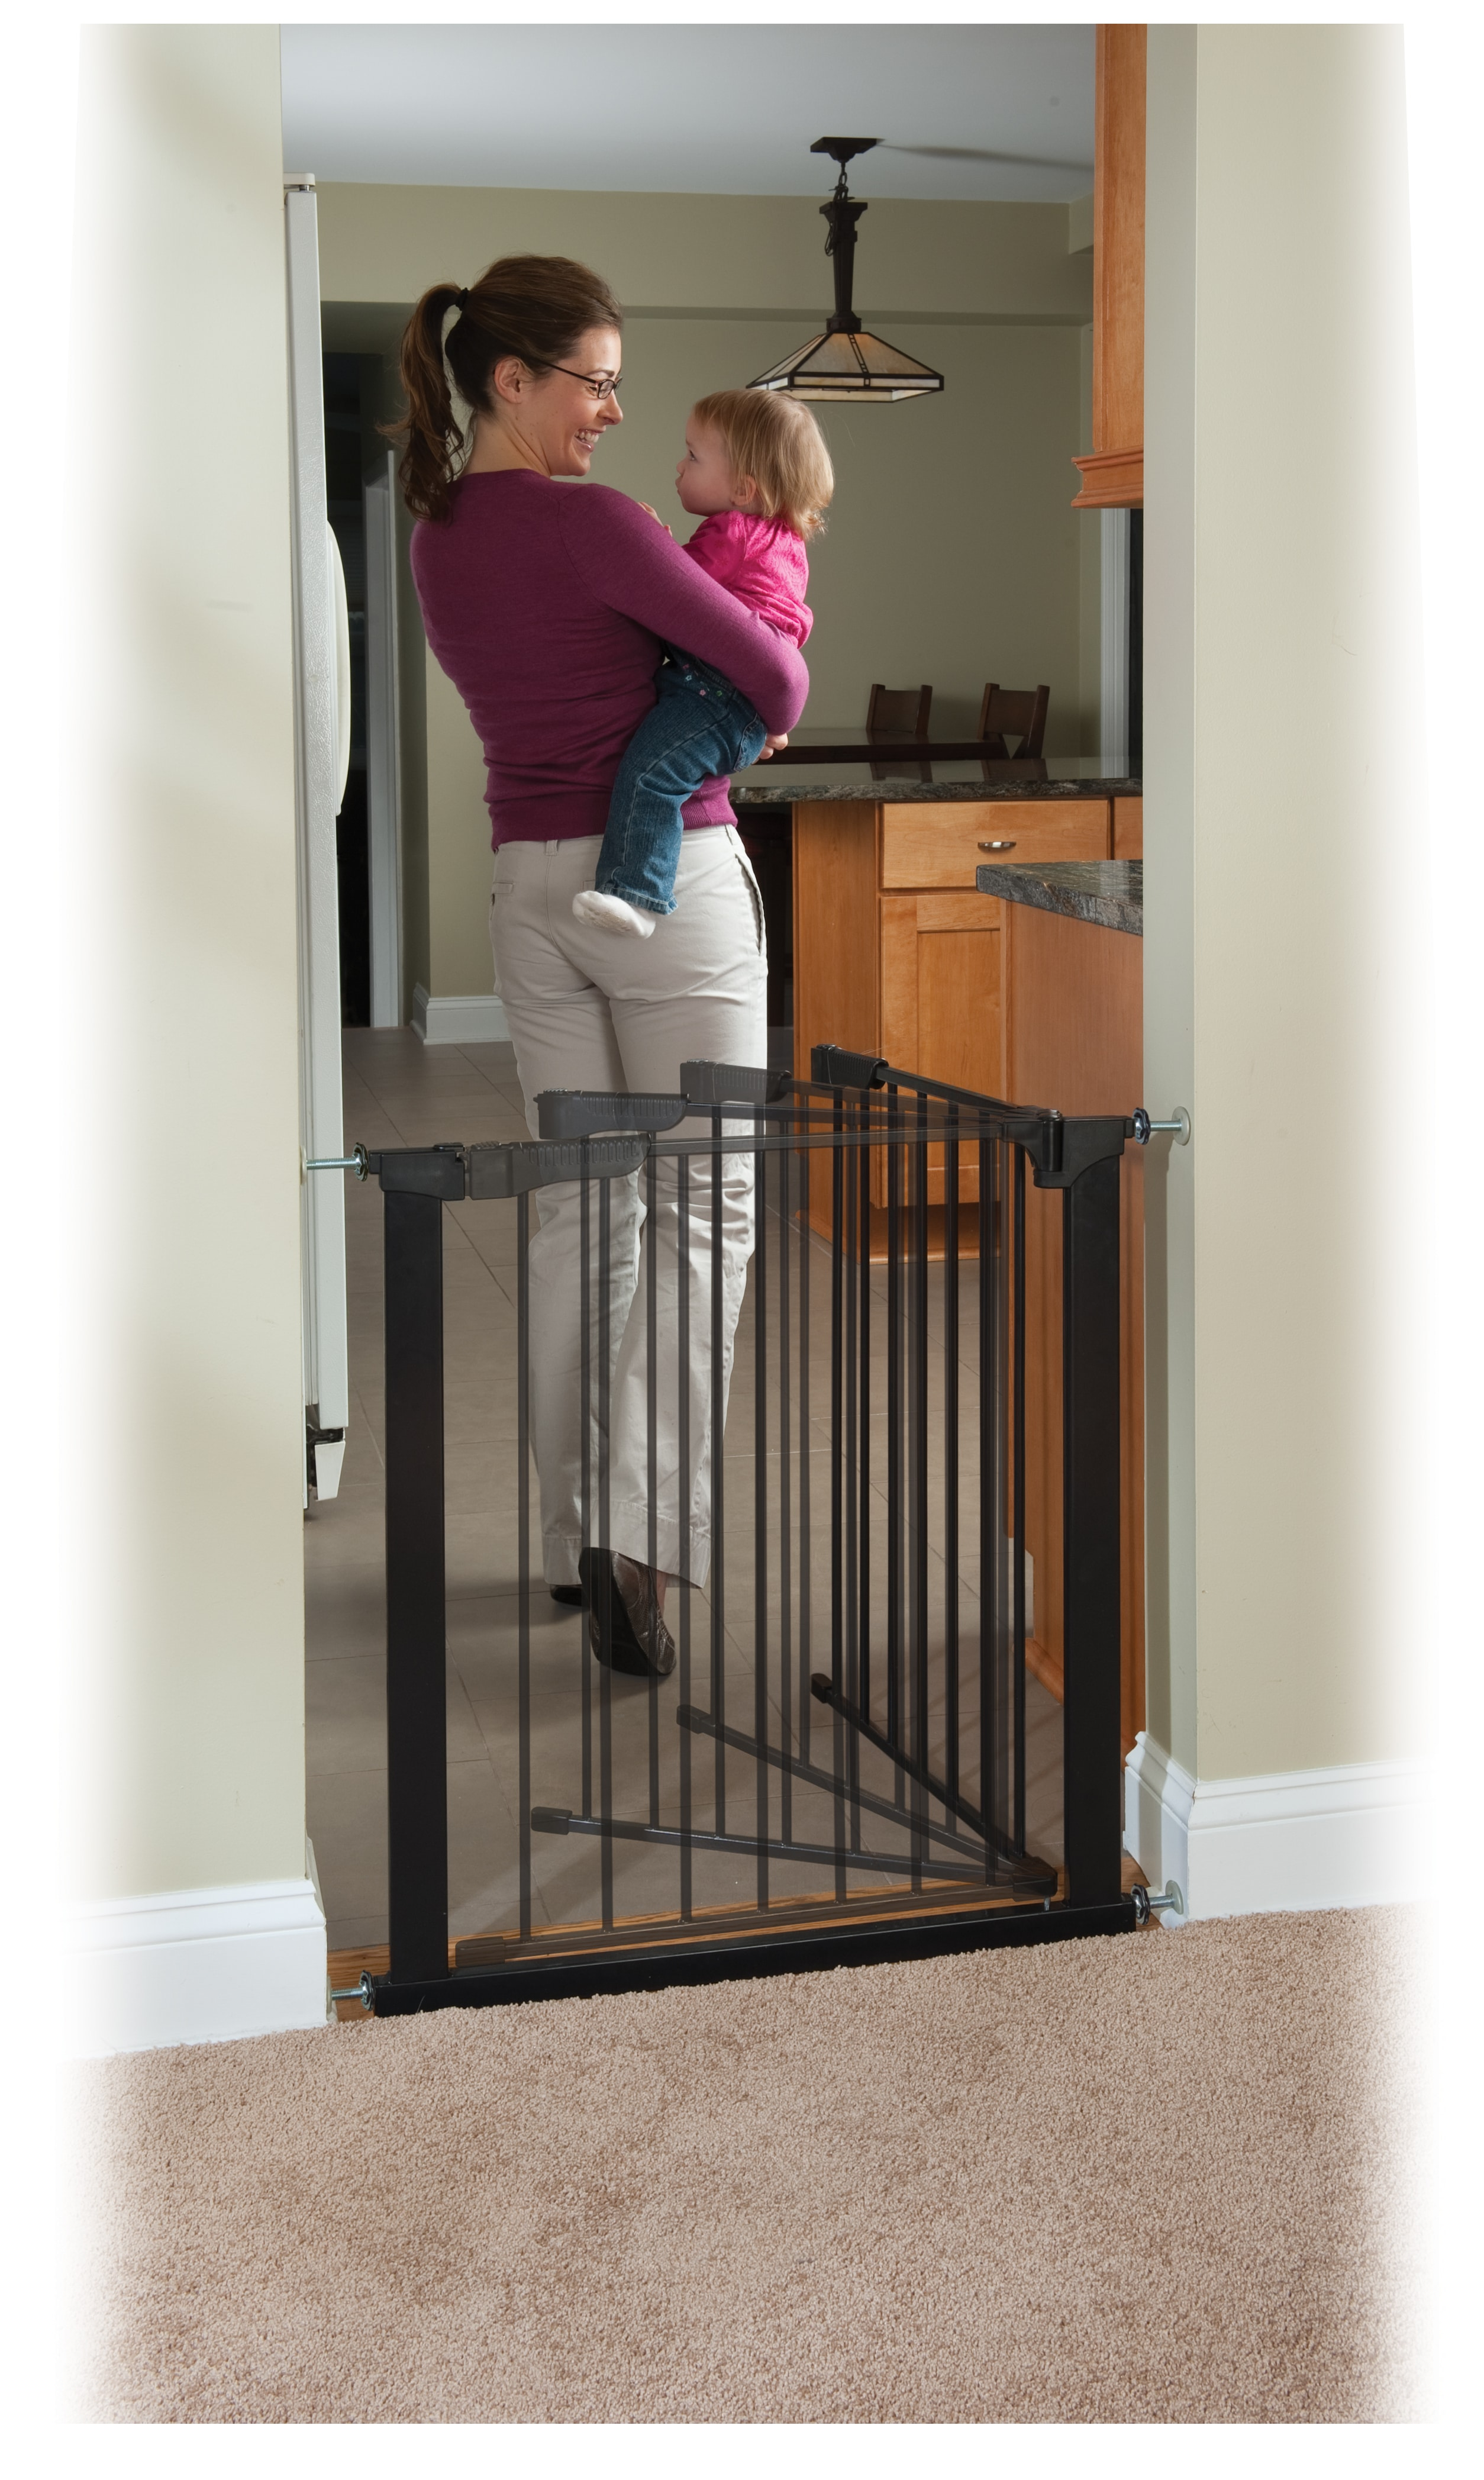 Fullsize Of Pressure Mounted Baby Gate